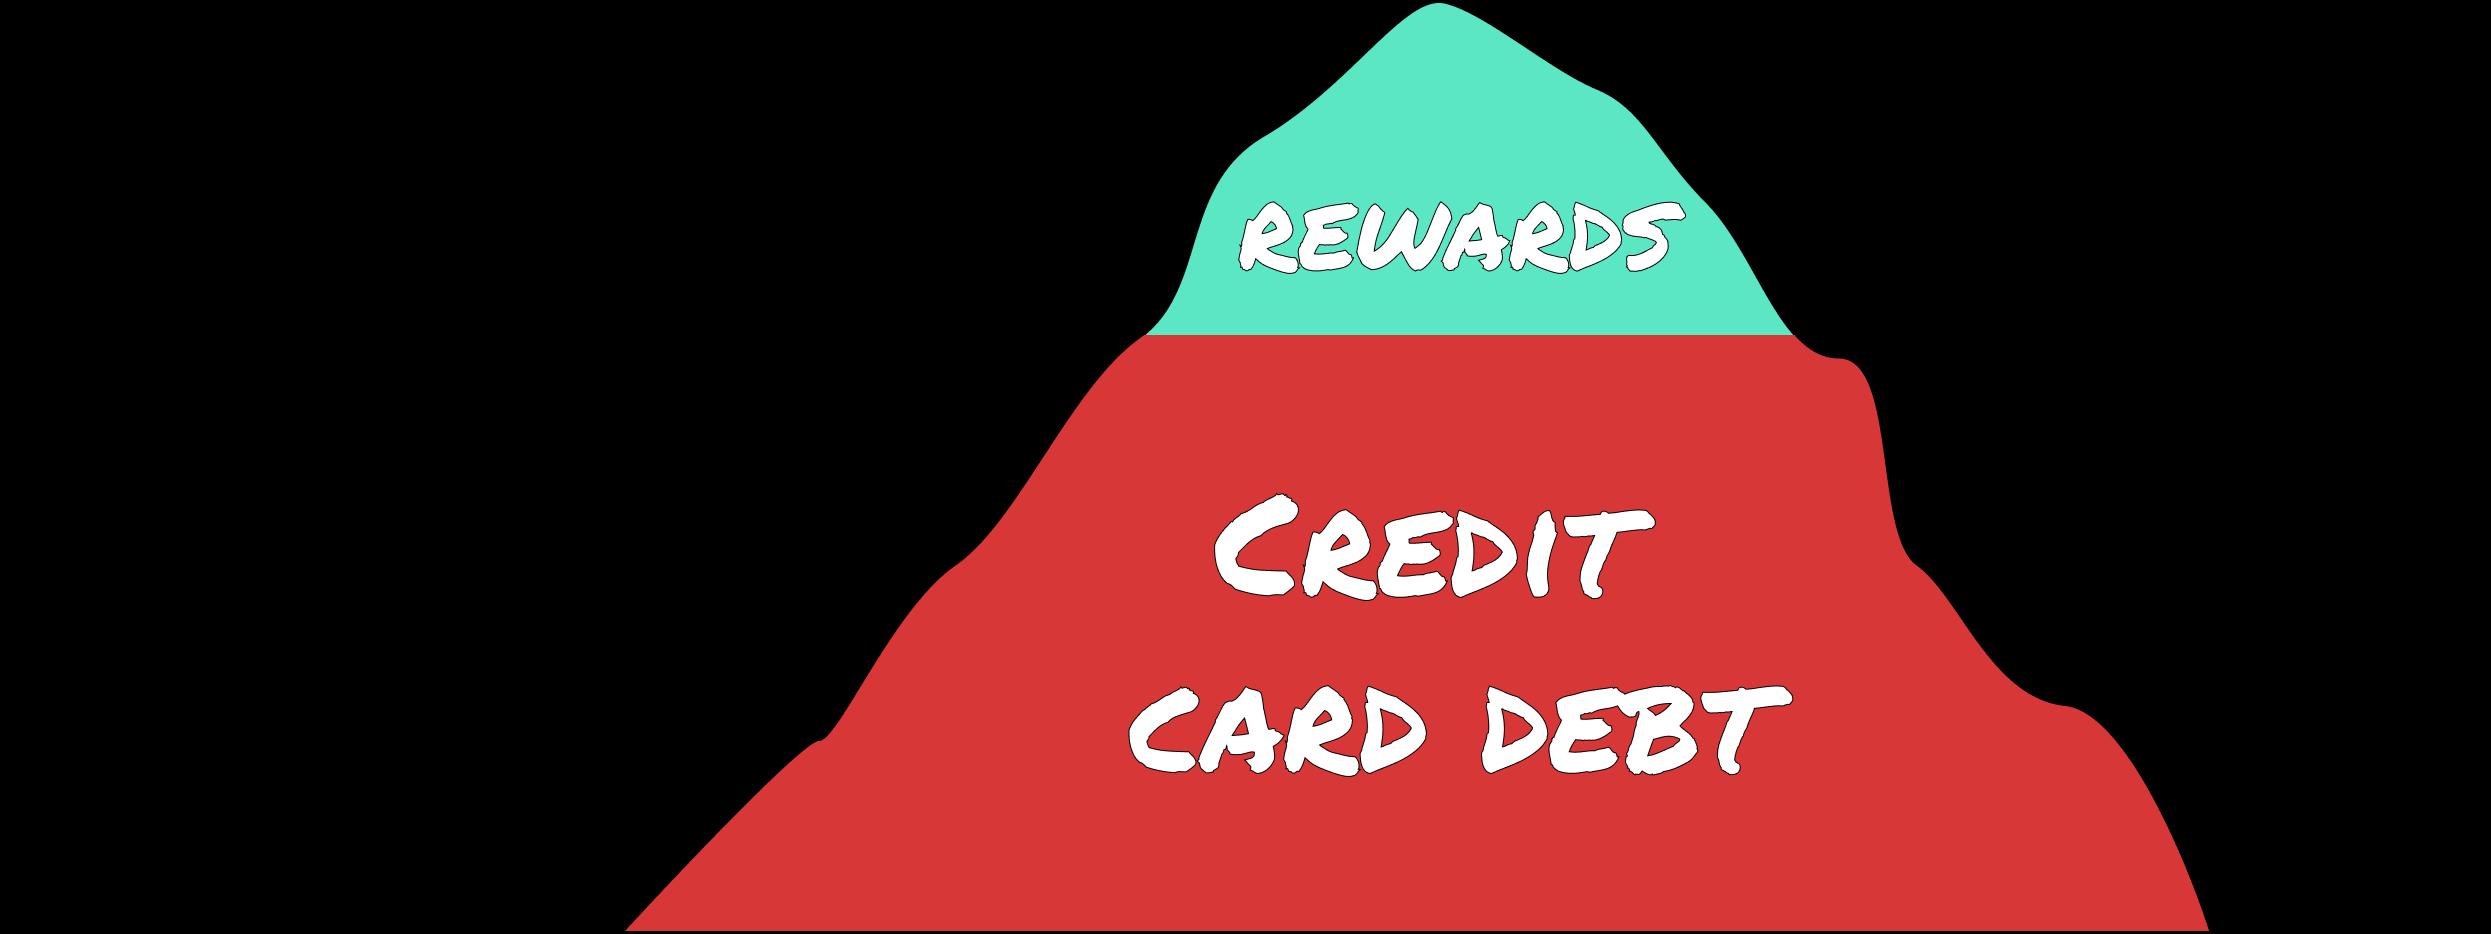 credit-card-debt-rewards-bonuses-chart